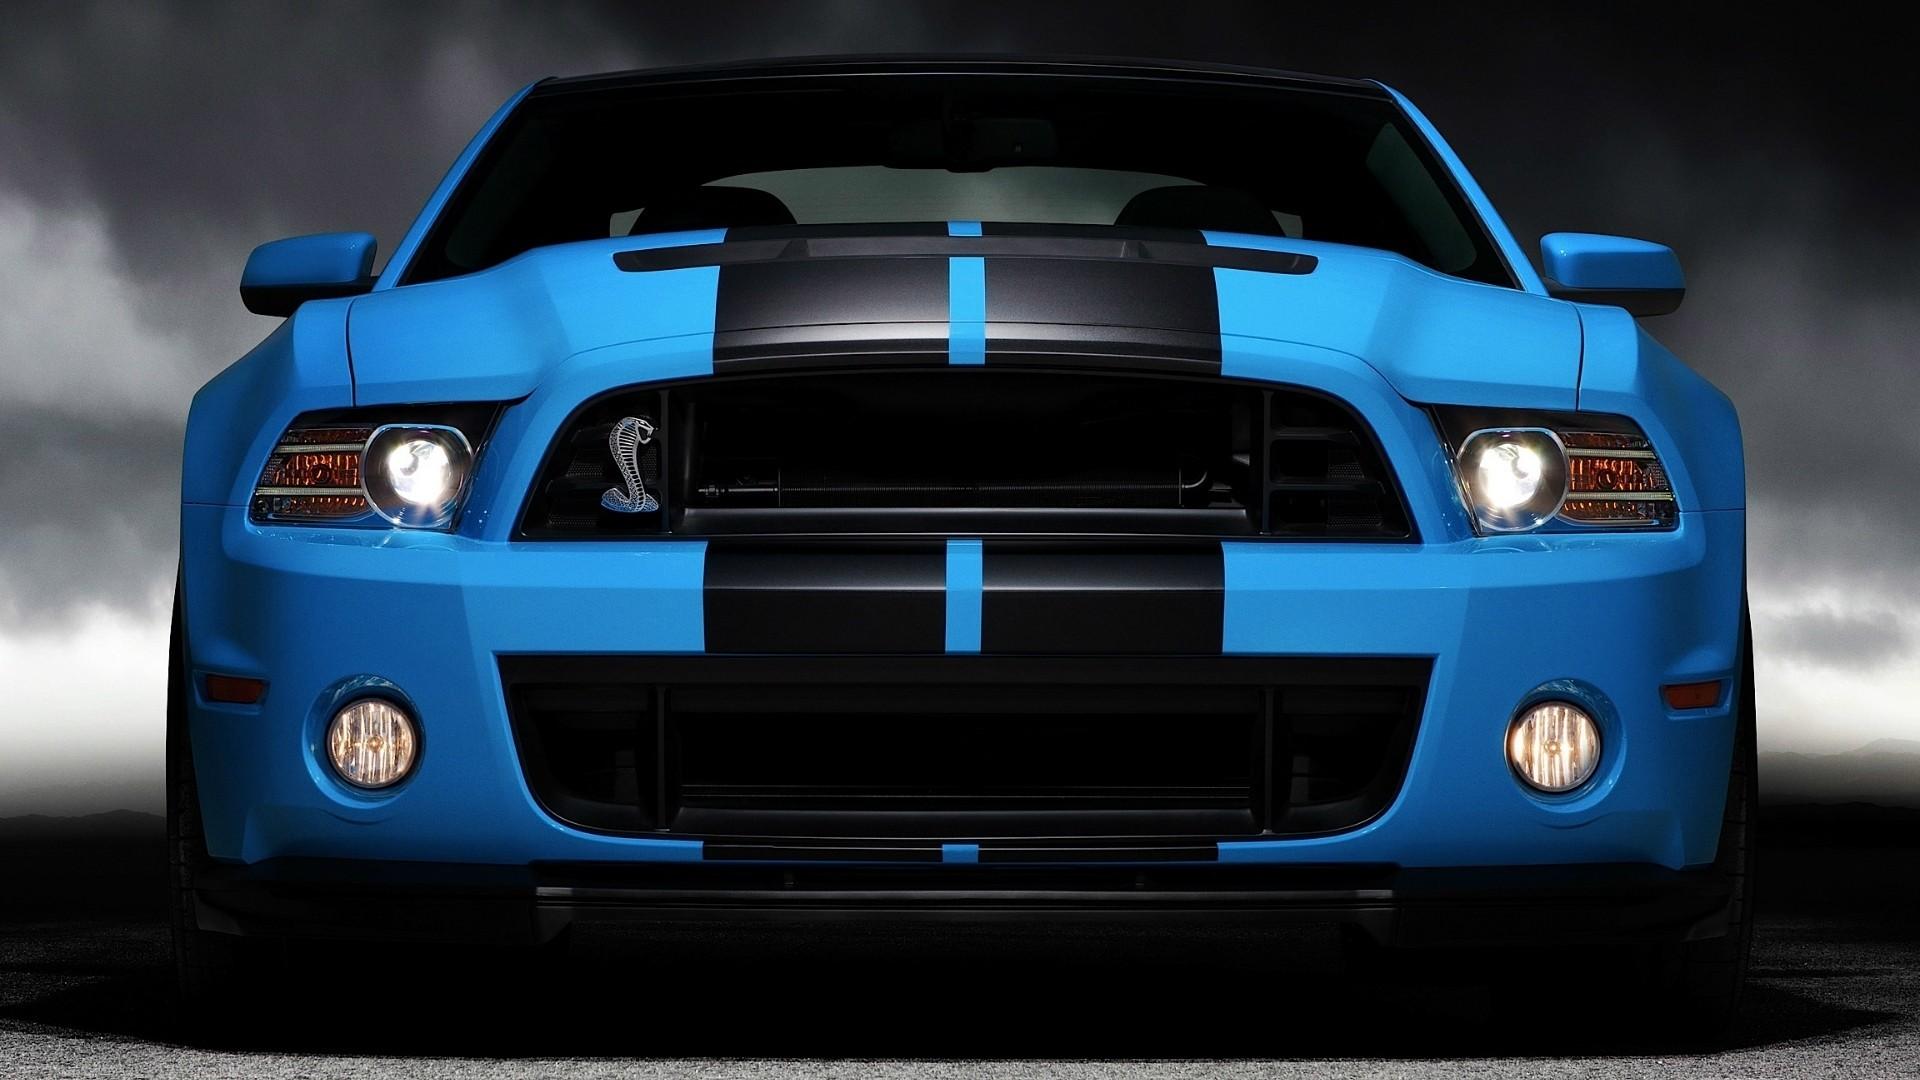 Ford Mustang Logo Wallpaper Hd – image #458